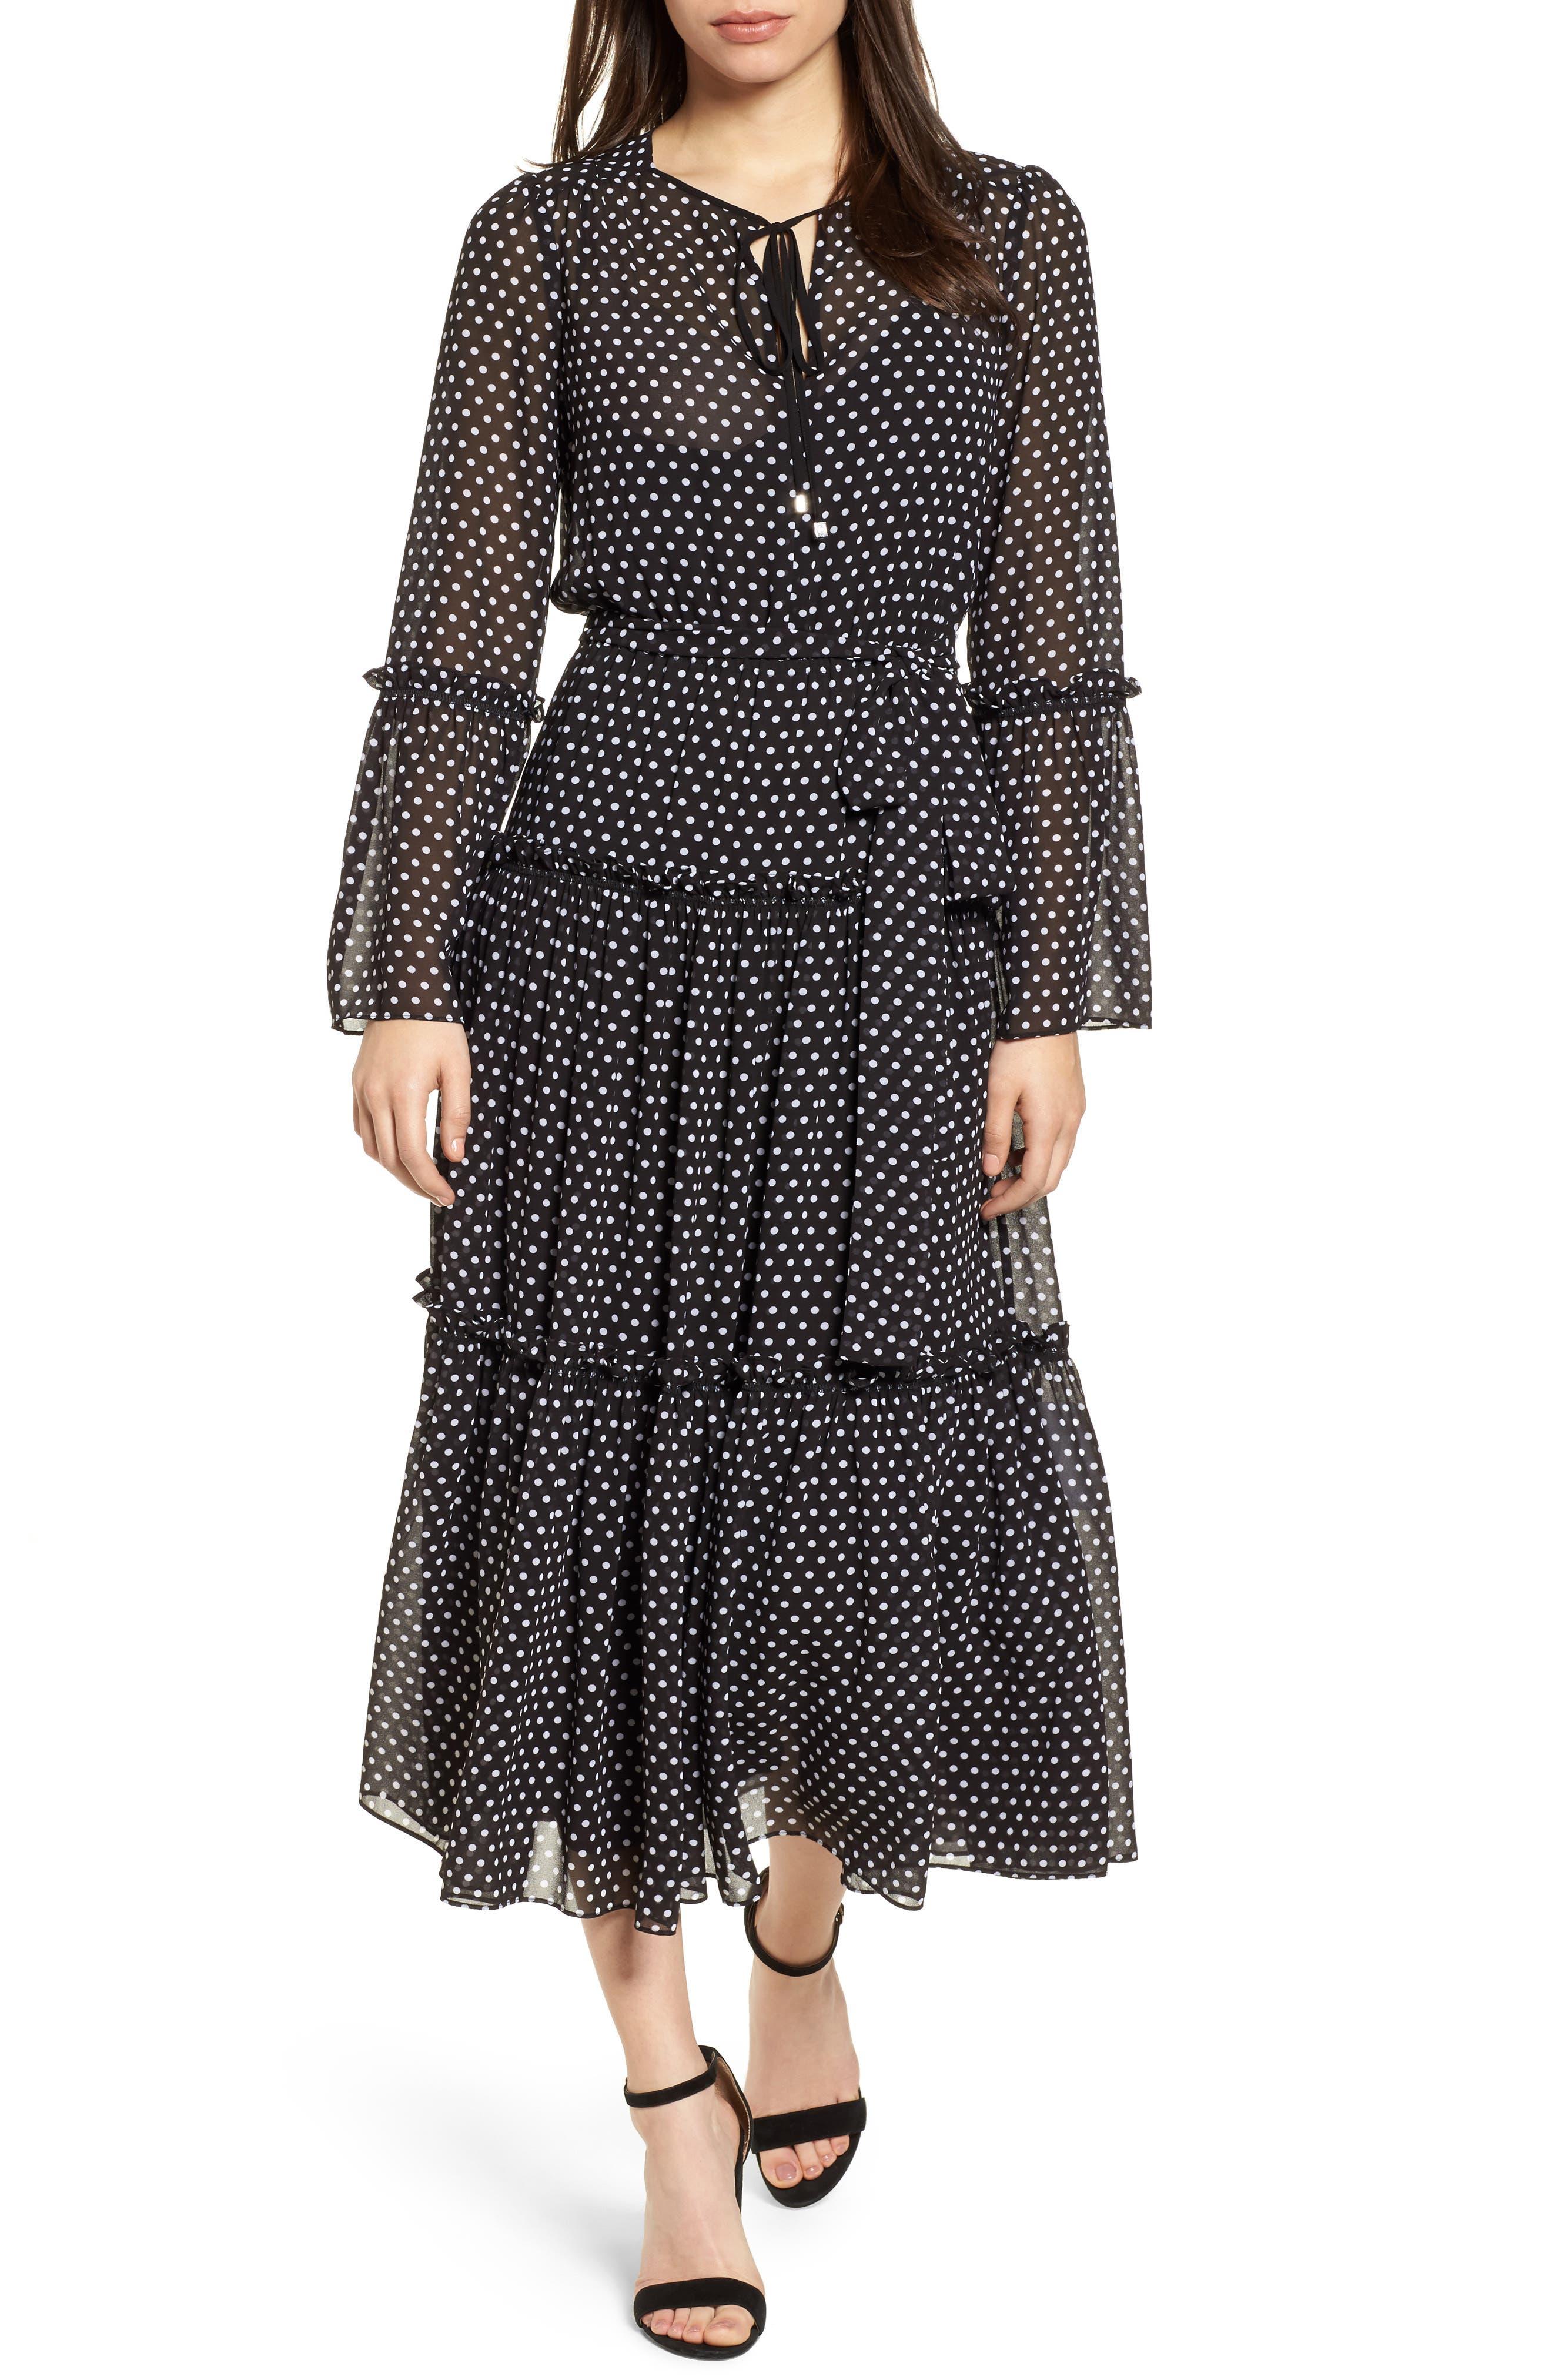 Tiered Dot Boho Dress,                             Main thumbnail 1, color,                             Black/ White